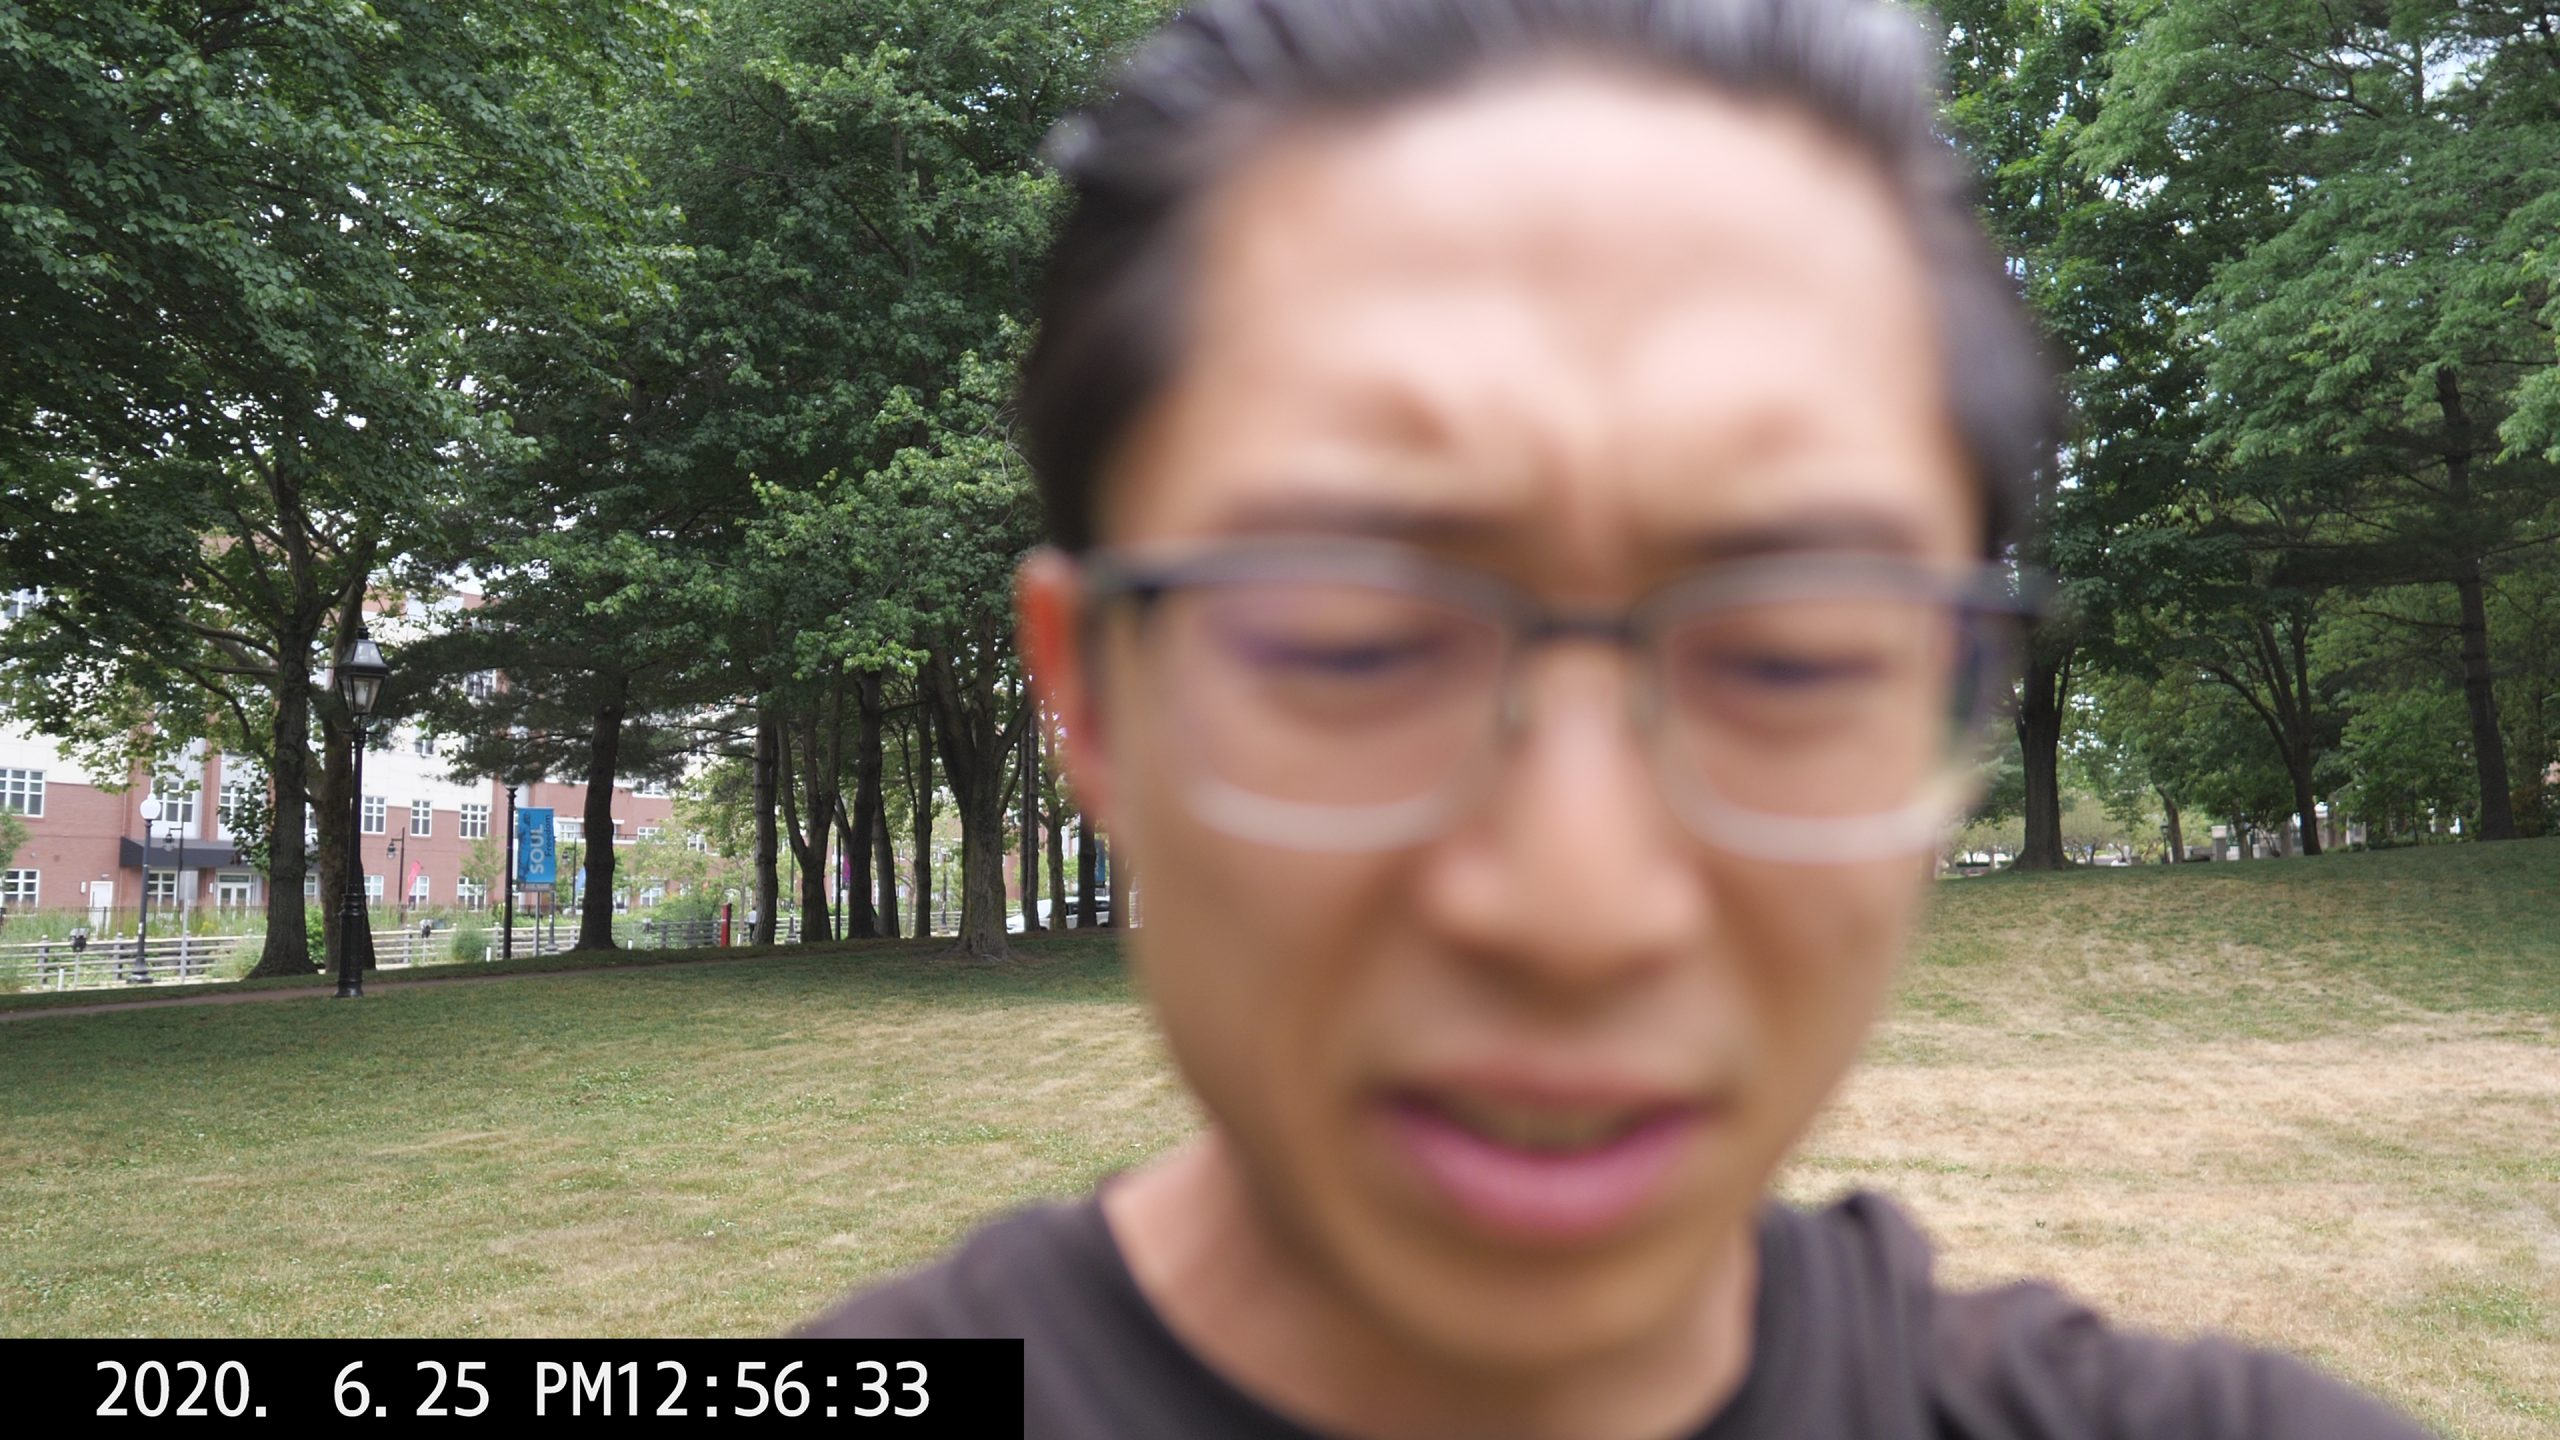 selfie ERIC KIM out of focus park